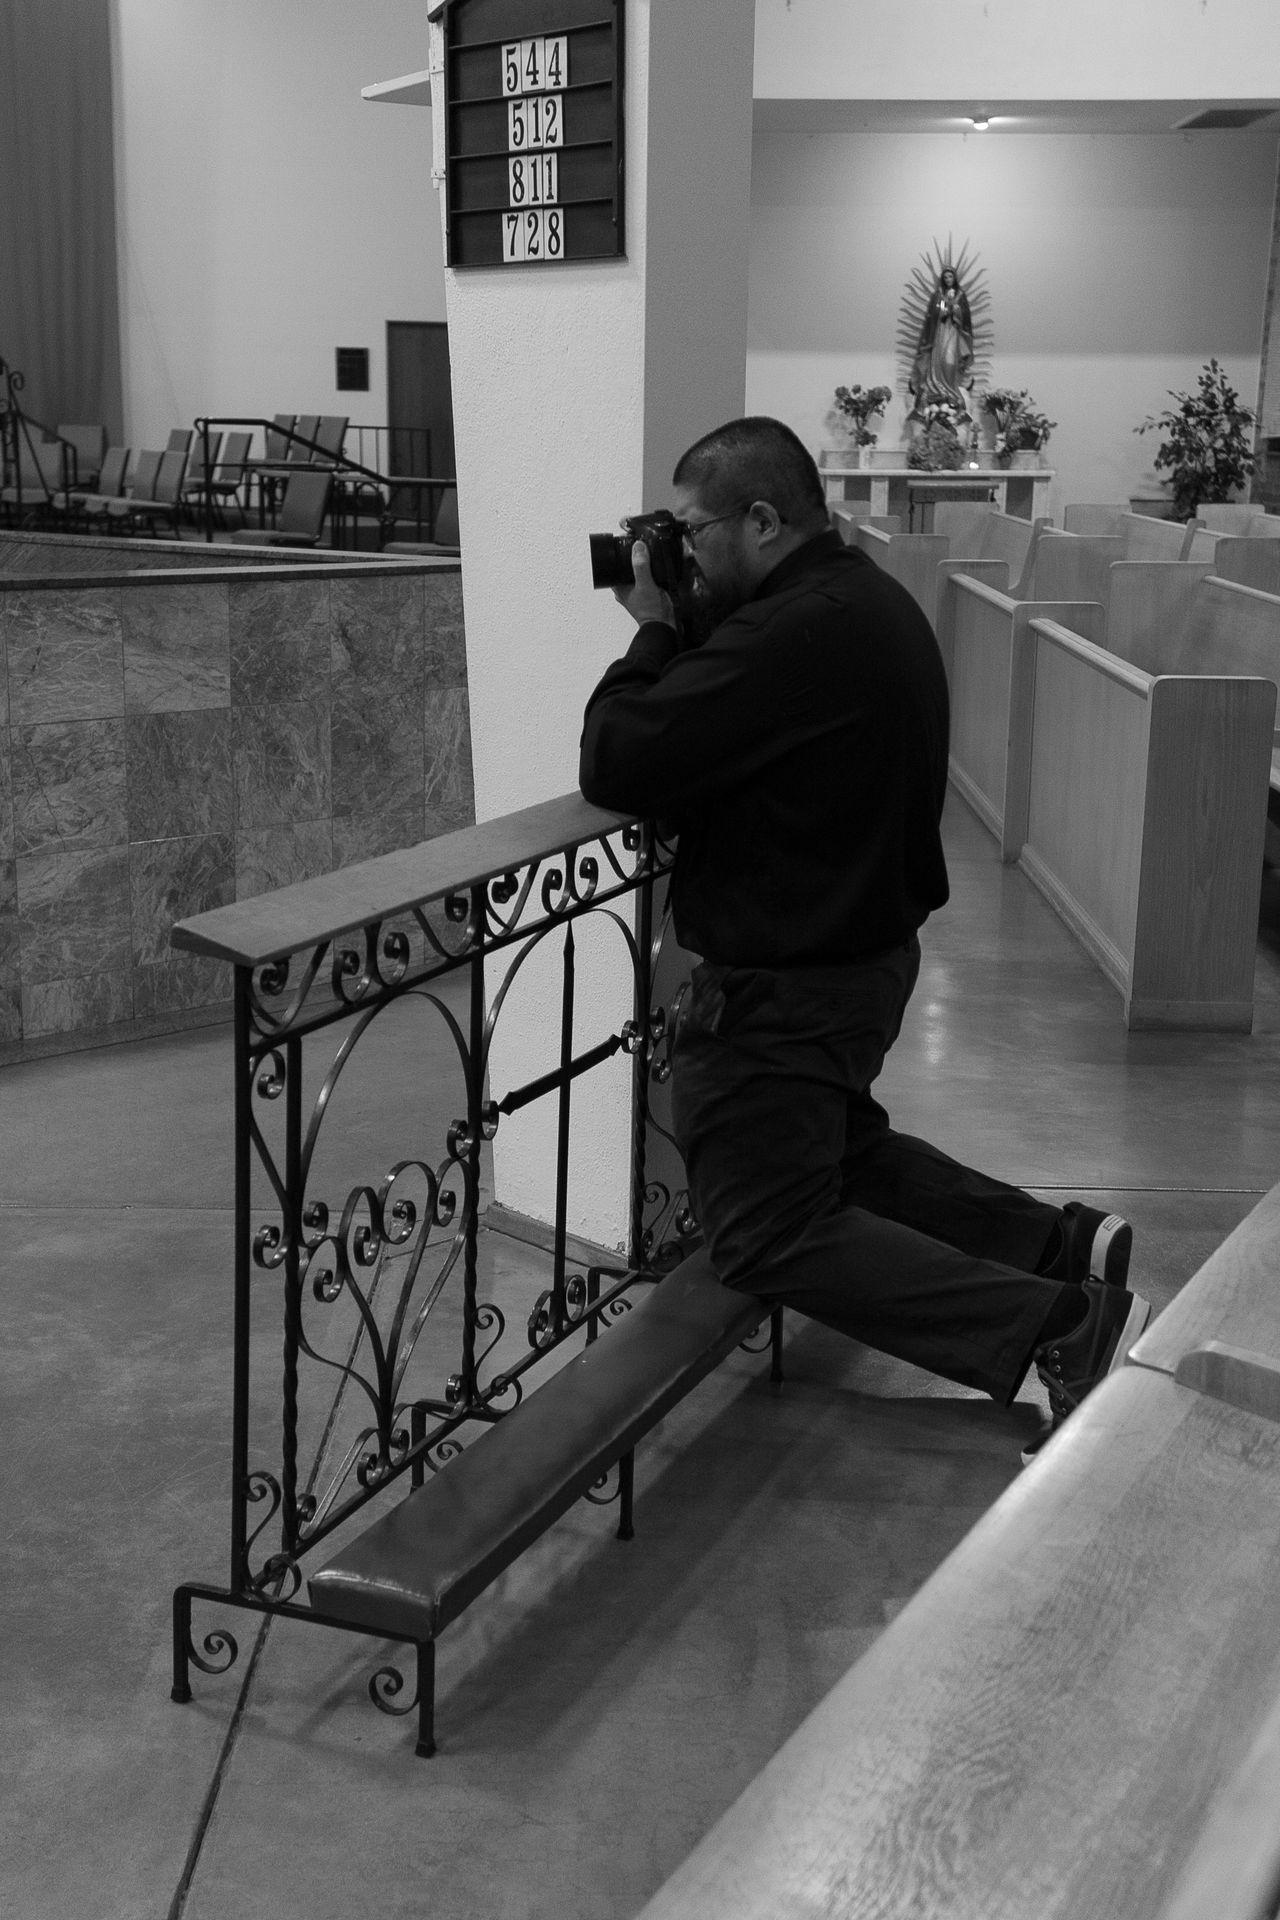 Praying to his own god. Absence Alltogether Behindthescenes Blackandwhite Ceiling Churchporn Flooring GodIsDead Hedidwhathewants Herewegoagain Hobbies Indoors  Inside Things Leisure Activity Metal Myhusband Occupation Outofplace Photography Preying Railing Secretshot Technology Tucson Arizona  Wall